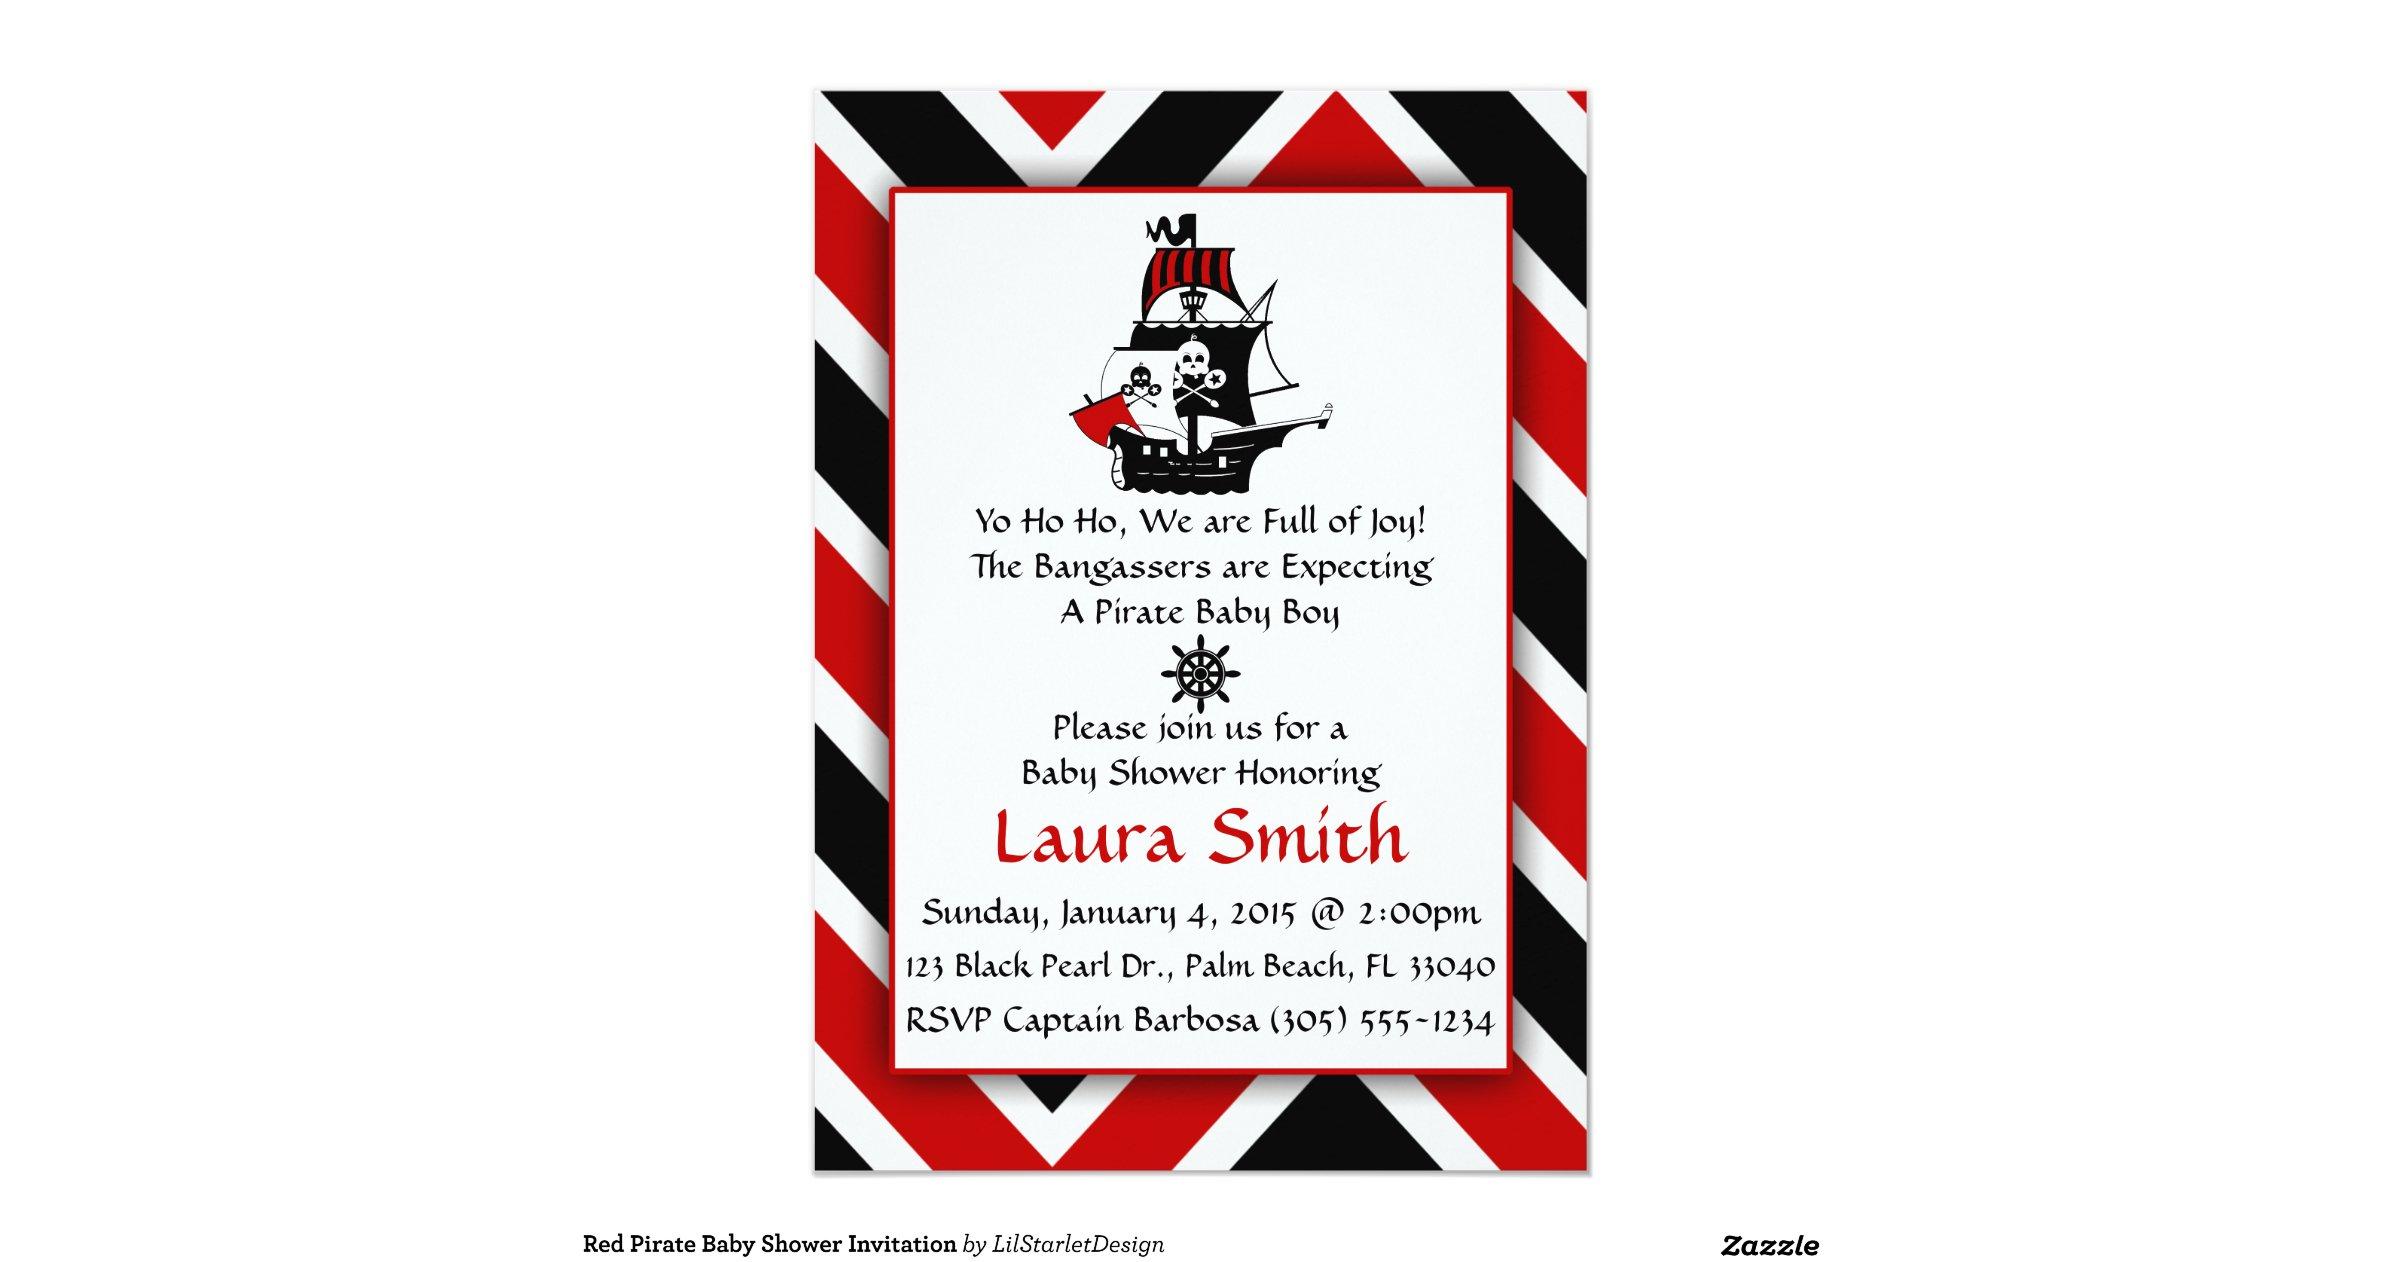 red pirate baby shower invitation r2664c4ed07a1480ea33f170cd16916eb